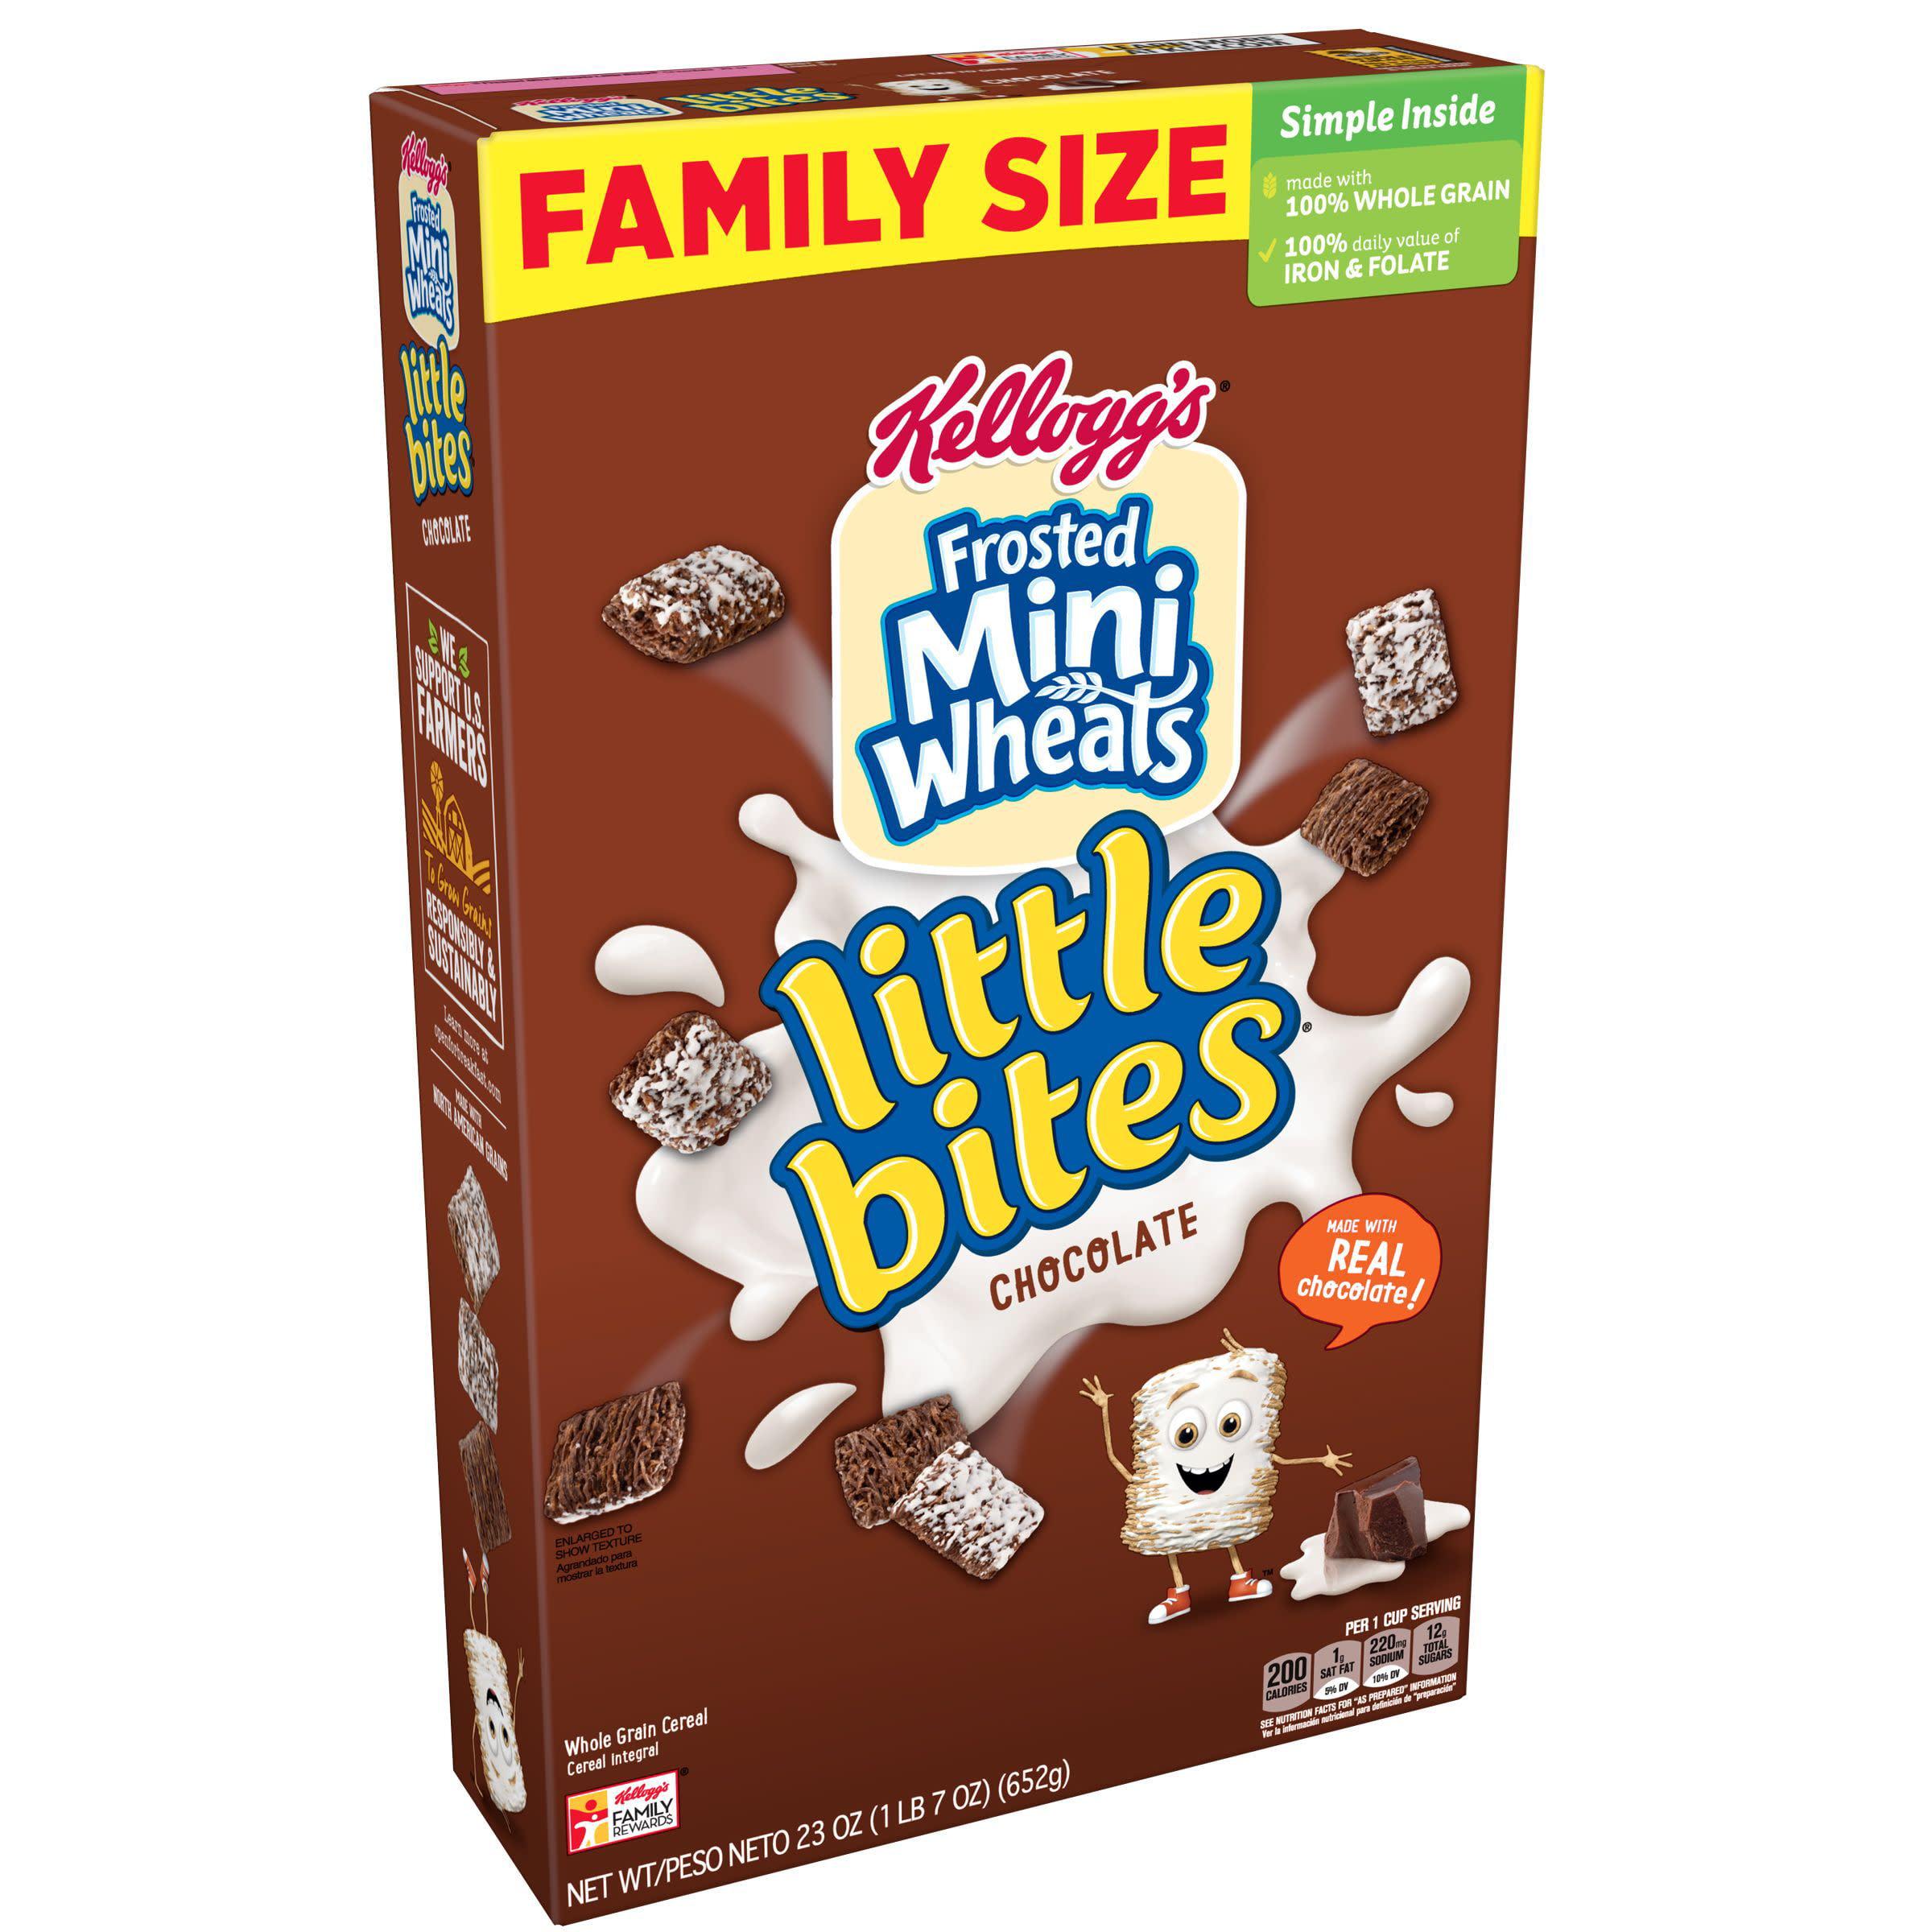 Kellogg's Frosted Chocolate Mini-Wheats Little Bites